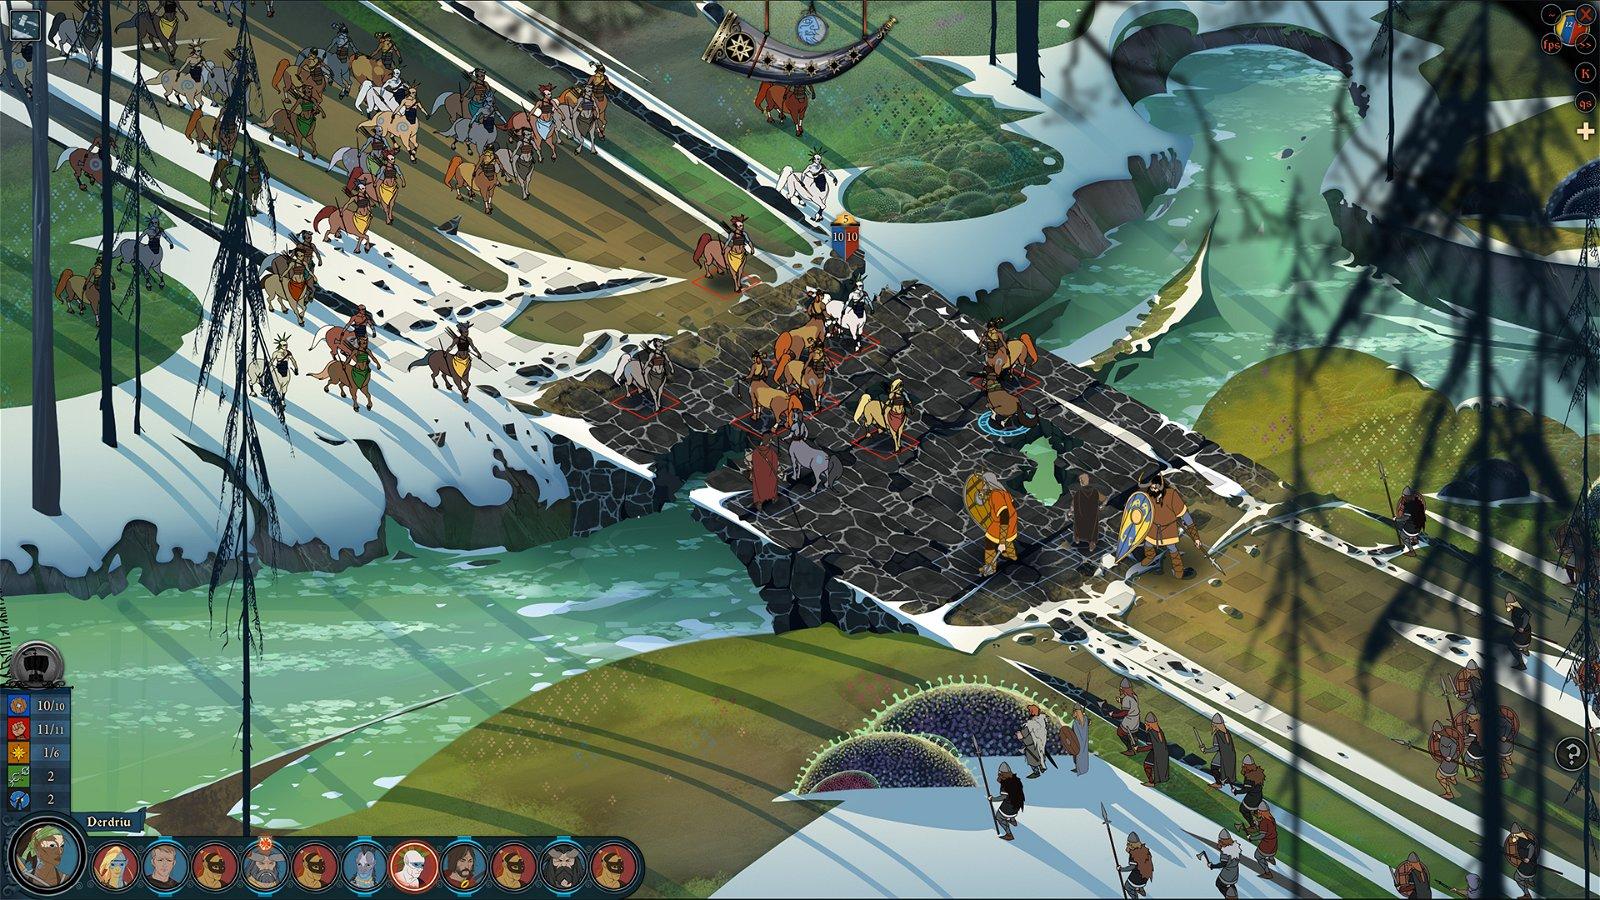 Banner Saga 2 (Pc) Review 1